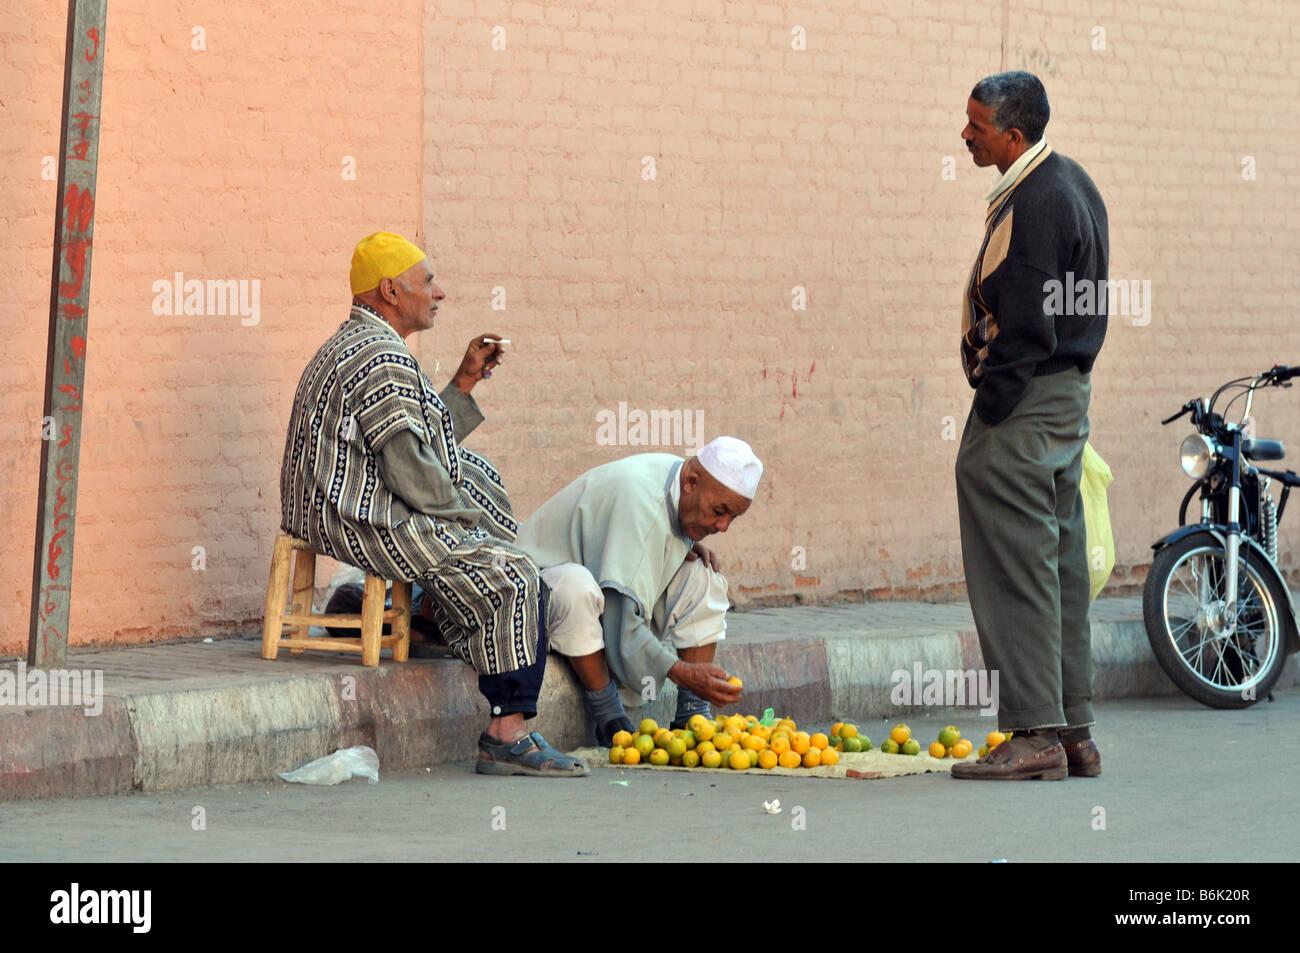 Local Men Marrakech, Morrocco - Stock Image